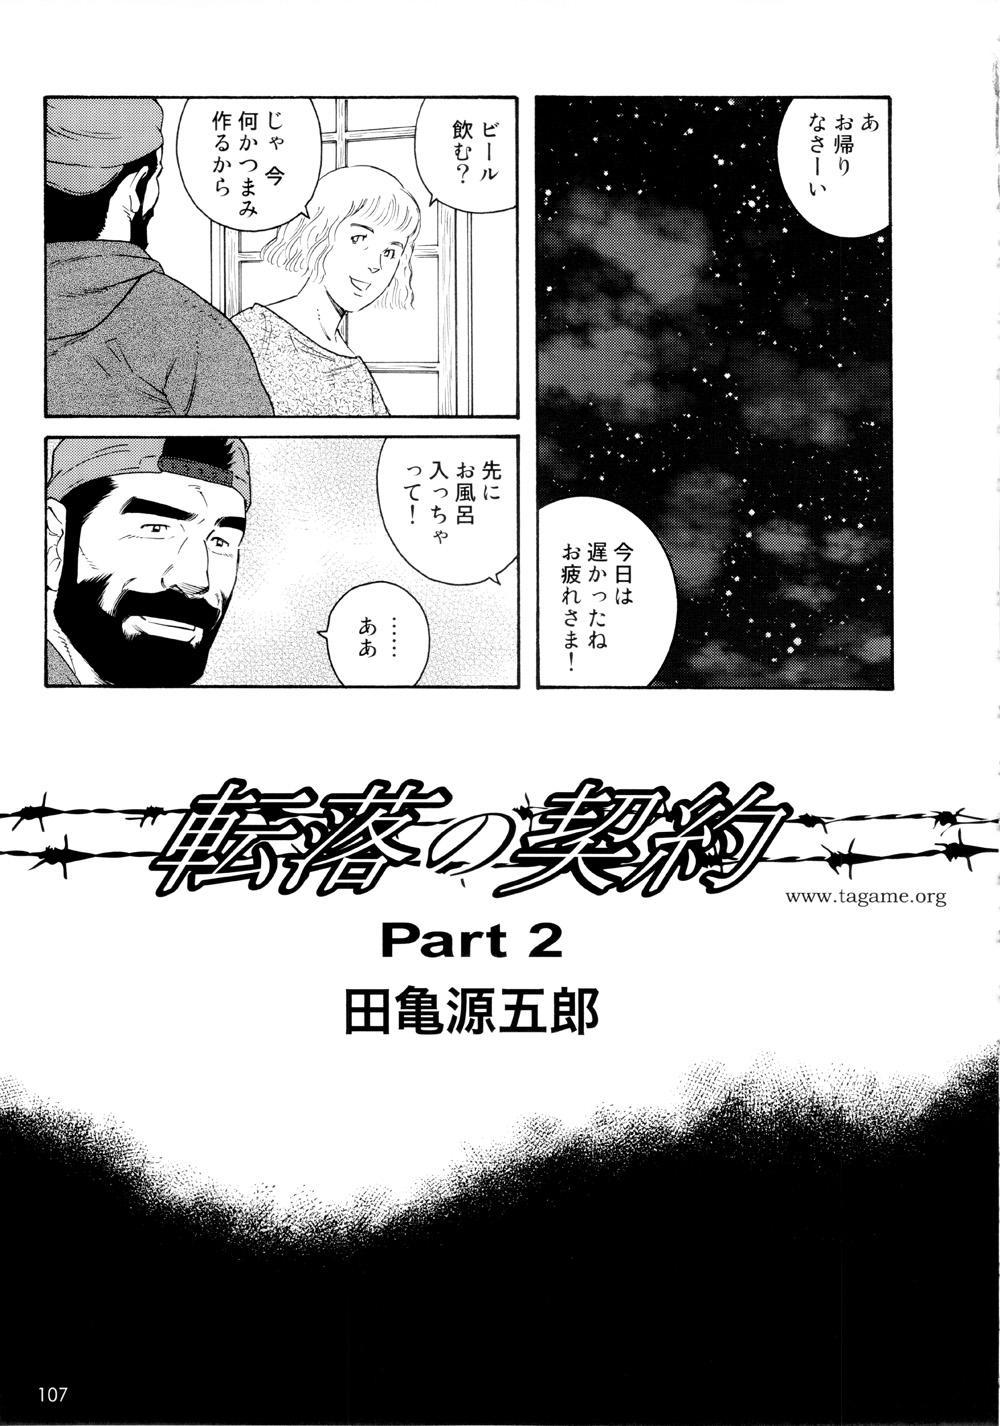 Genryu Chapter 2 0